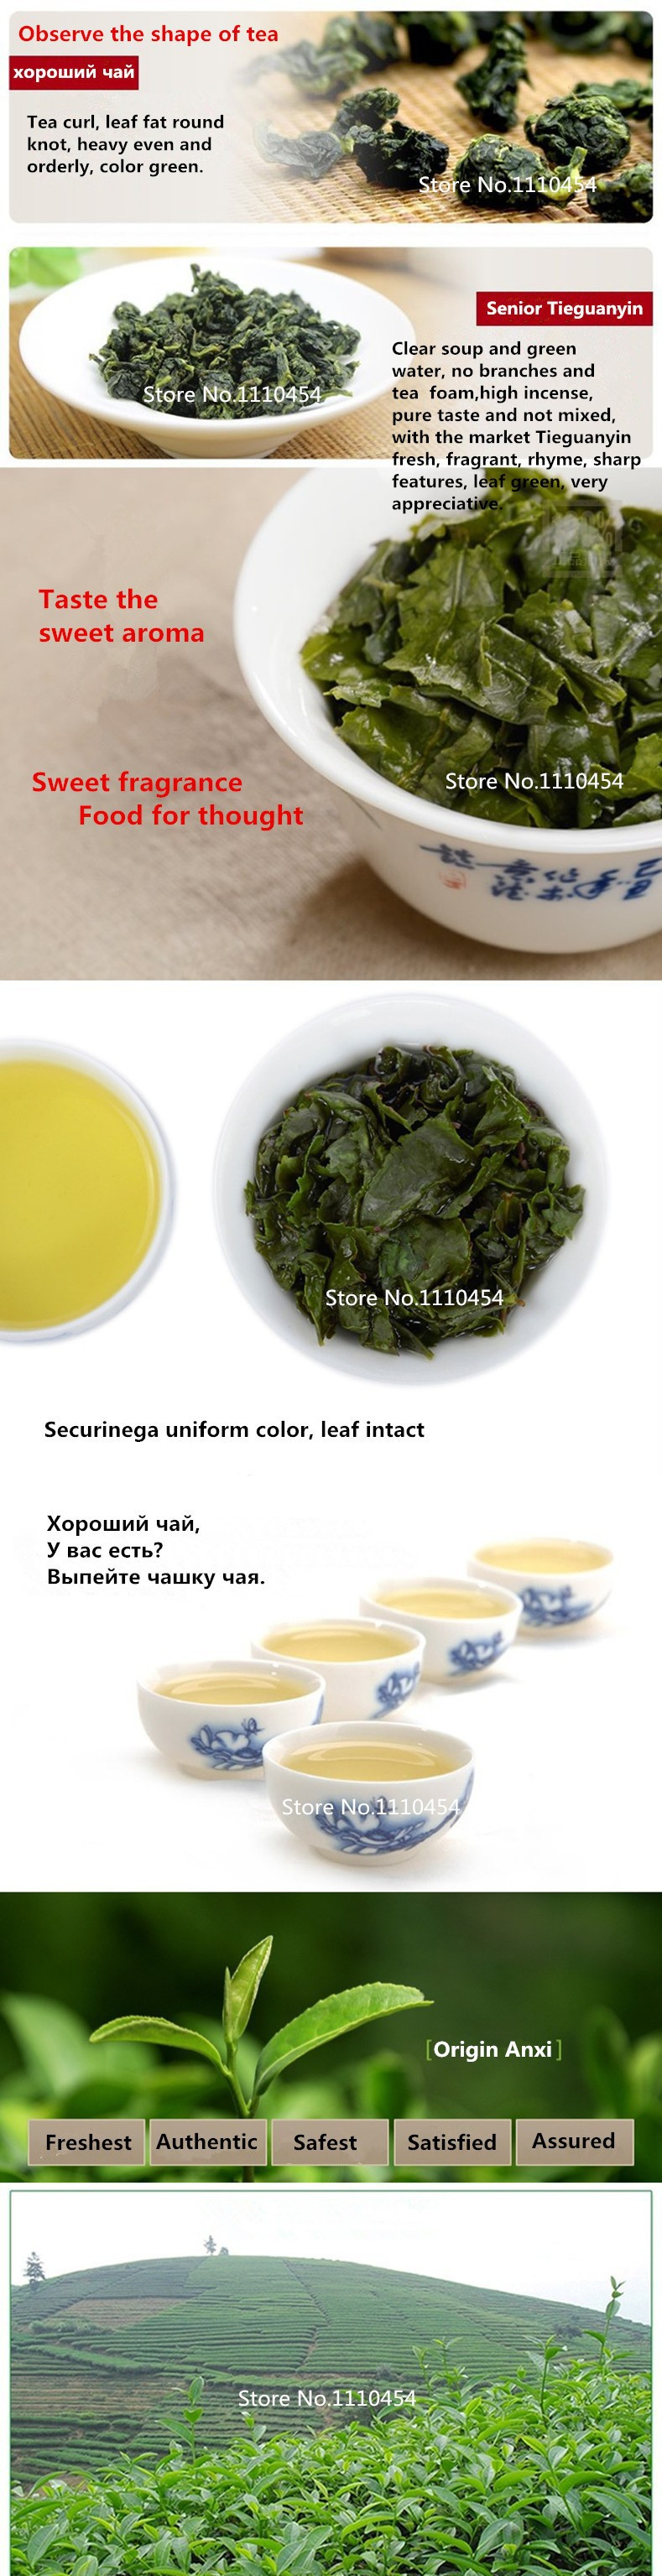 Hot sale !Taiwan High Mountains New Spring Oolong Tea 250g,Tikuanyin tea,Tieguanyin tea,Green tea Free Shipping!